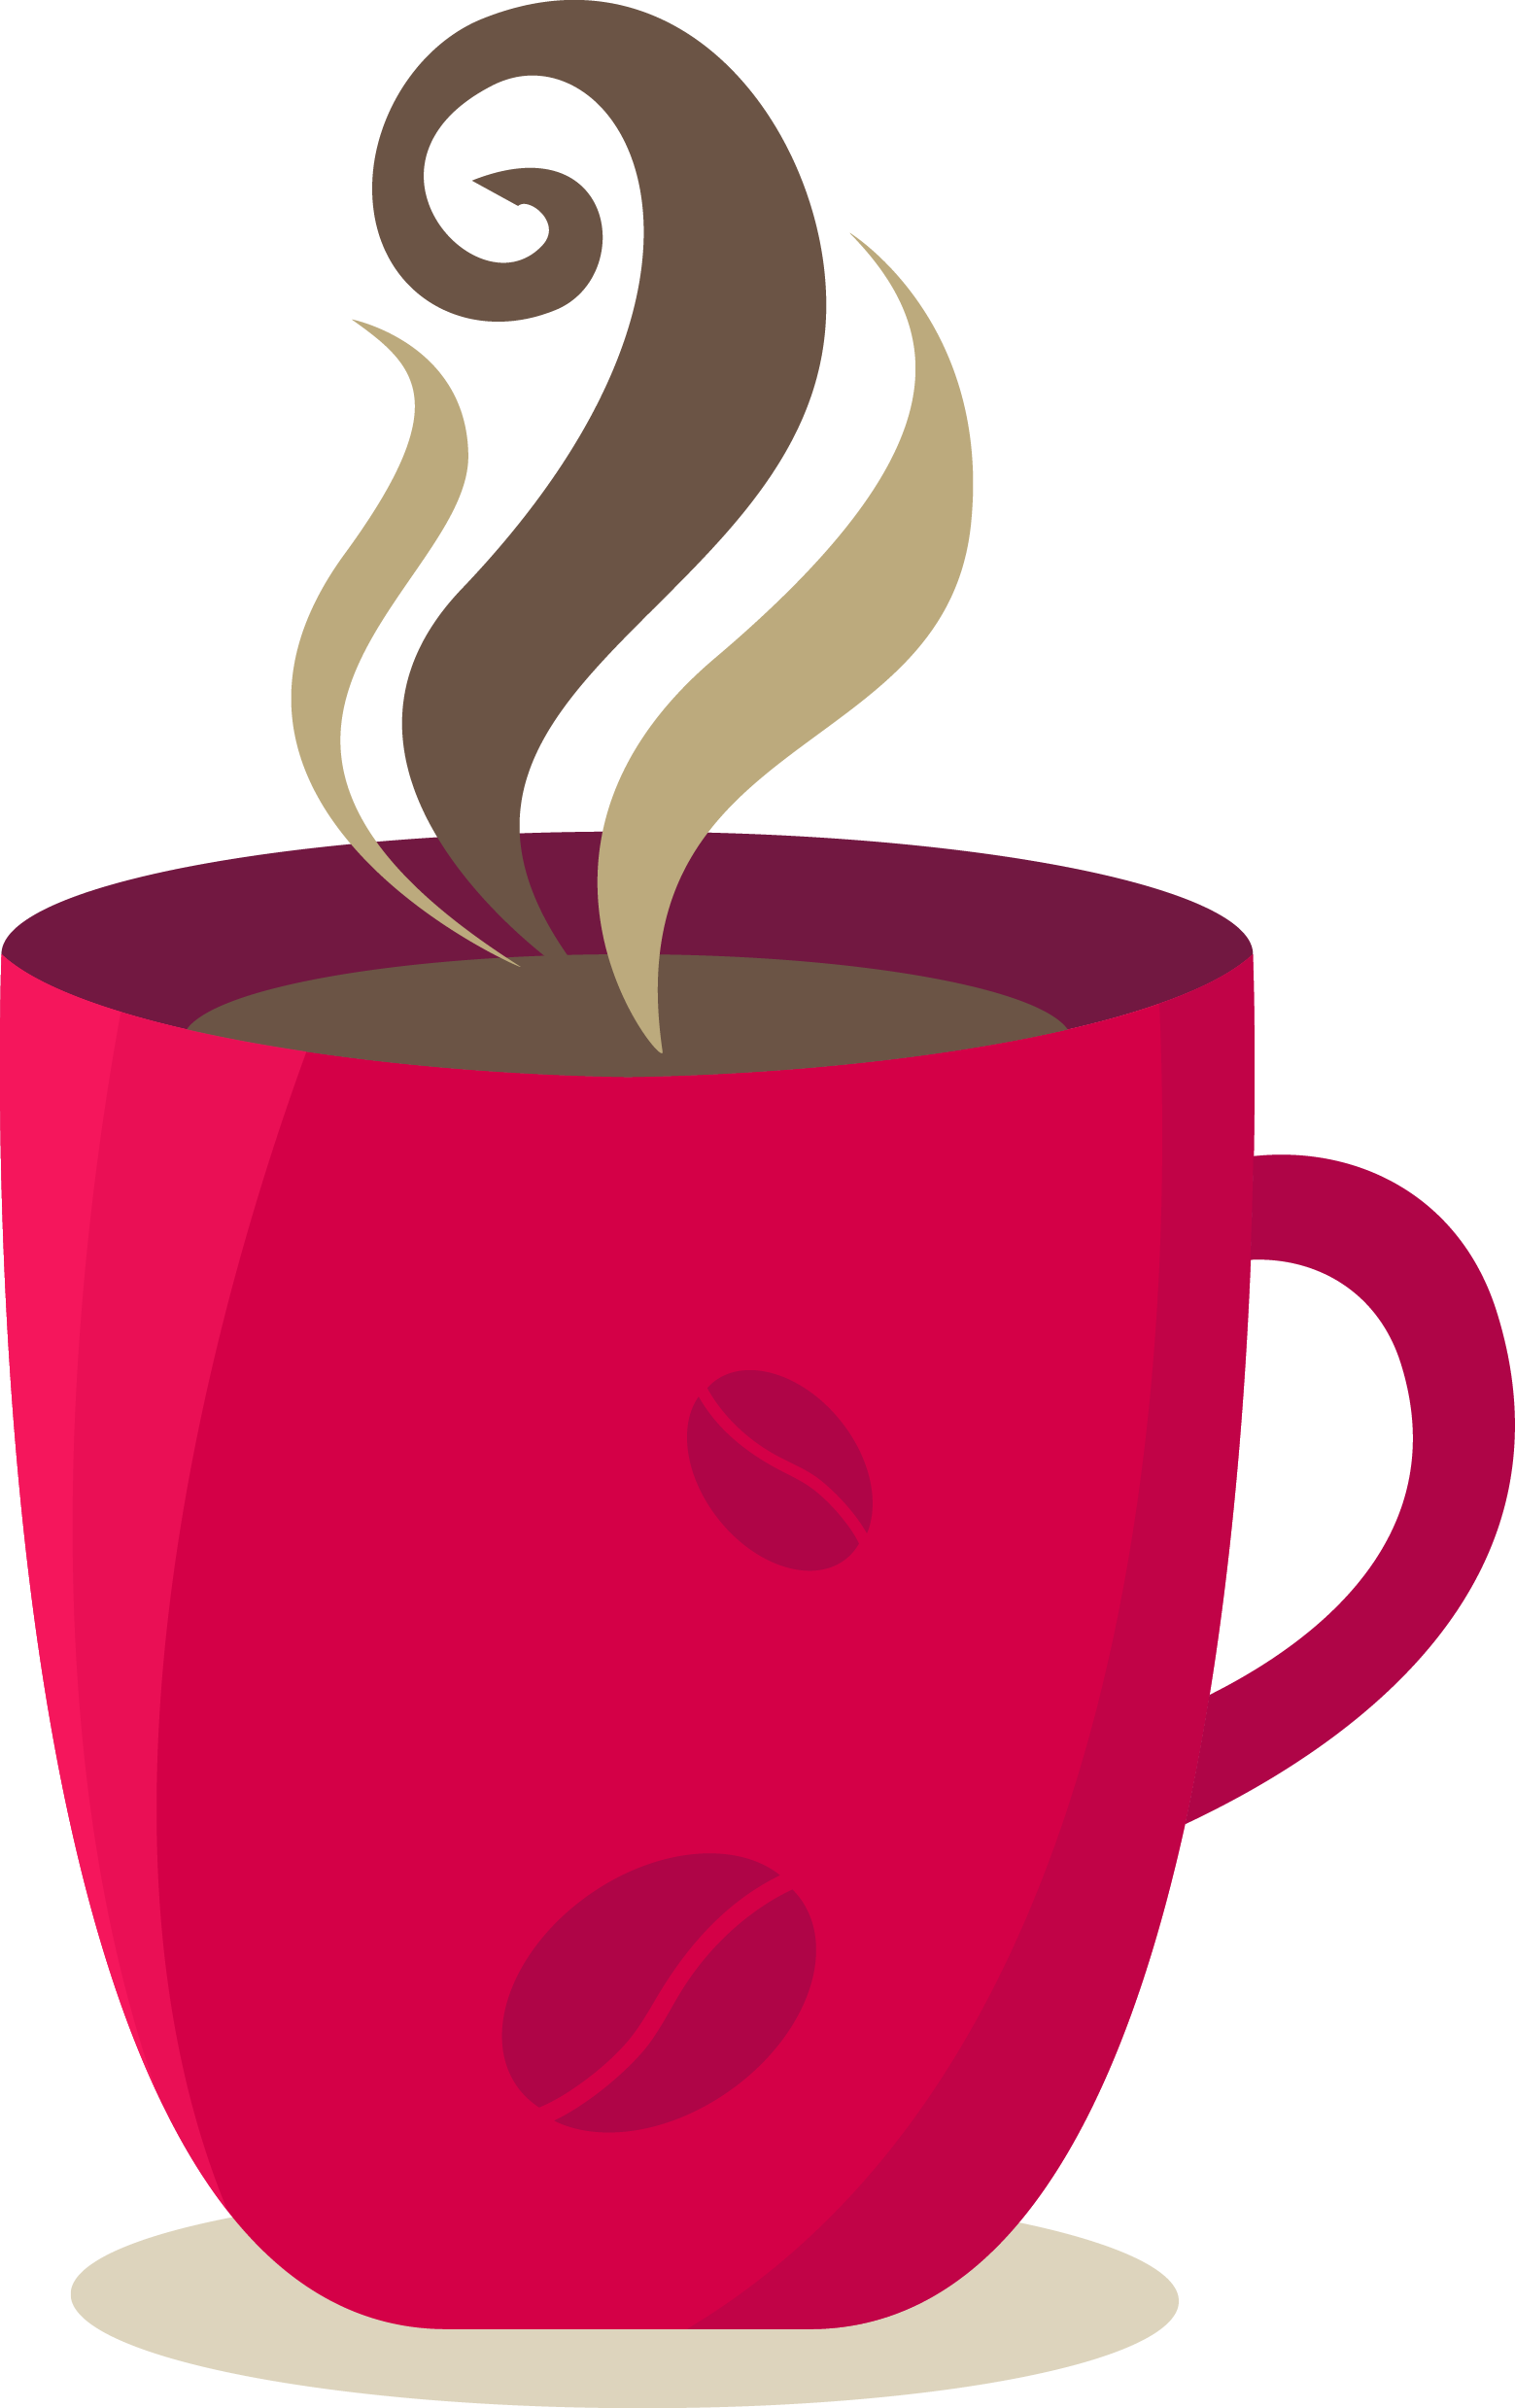 Cup cafe cartoon material. Mug clipart coffee bagel